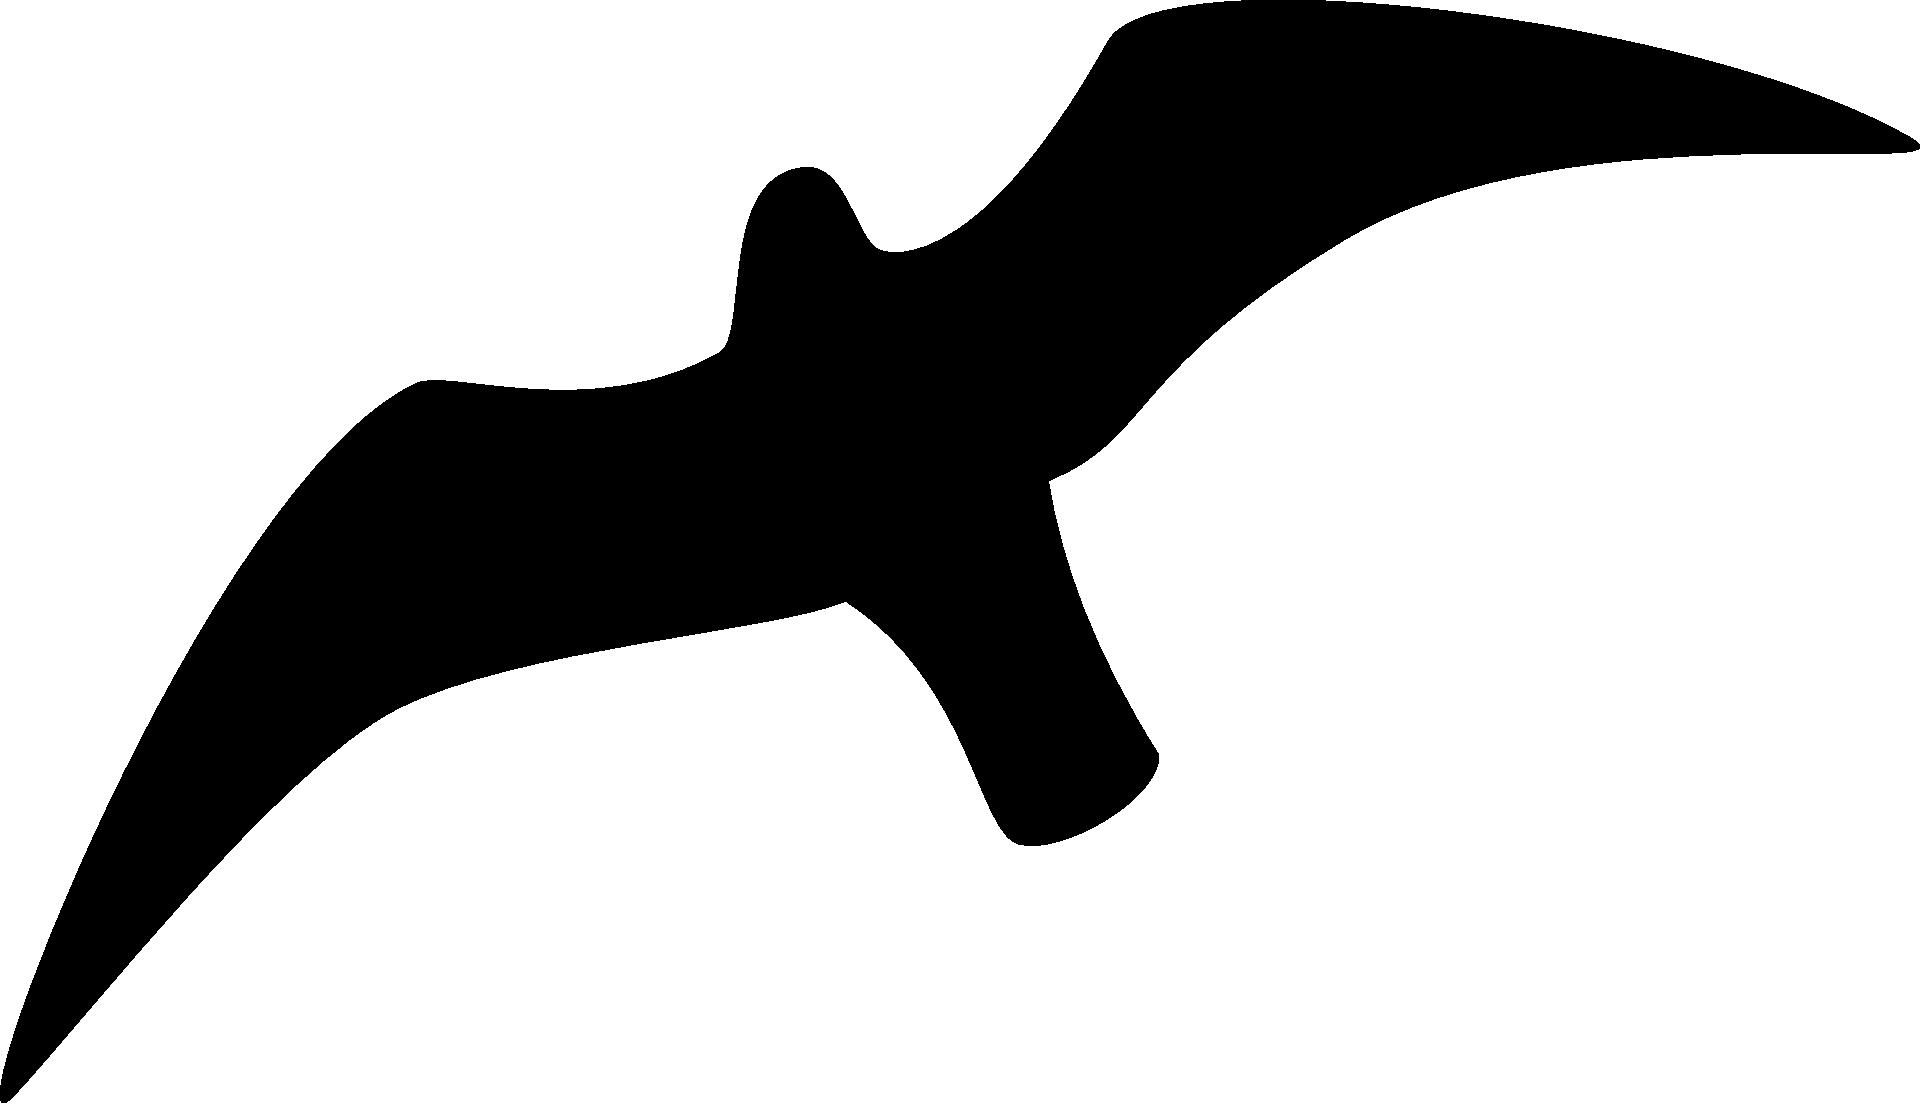 seagull silhouette clip art - HD1920×1103